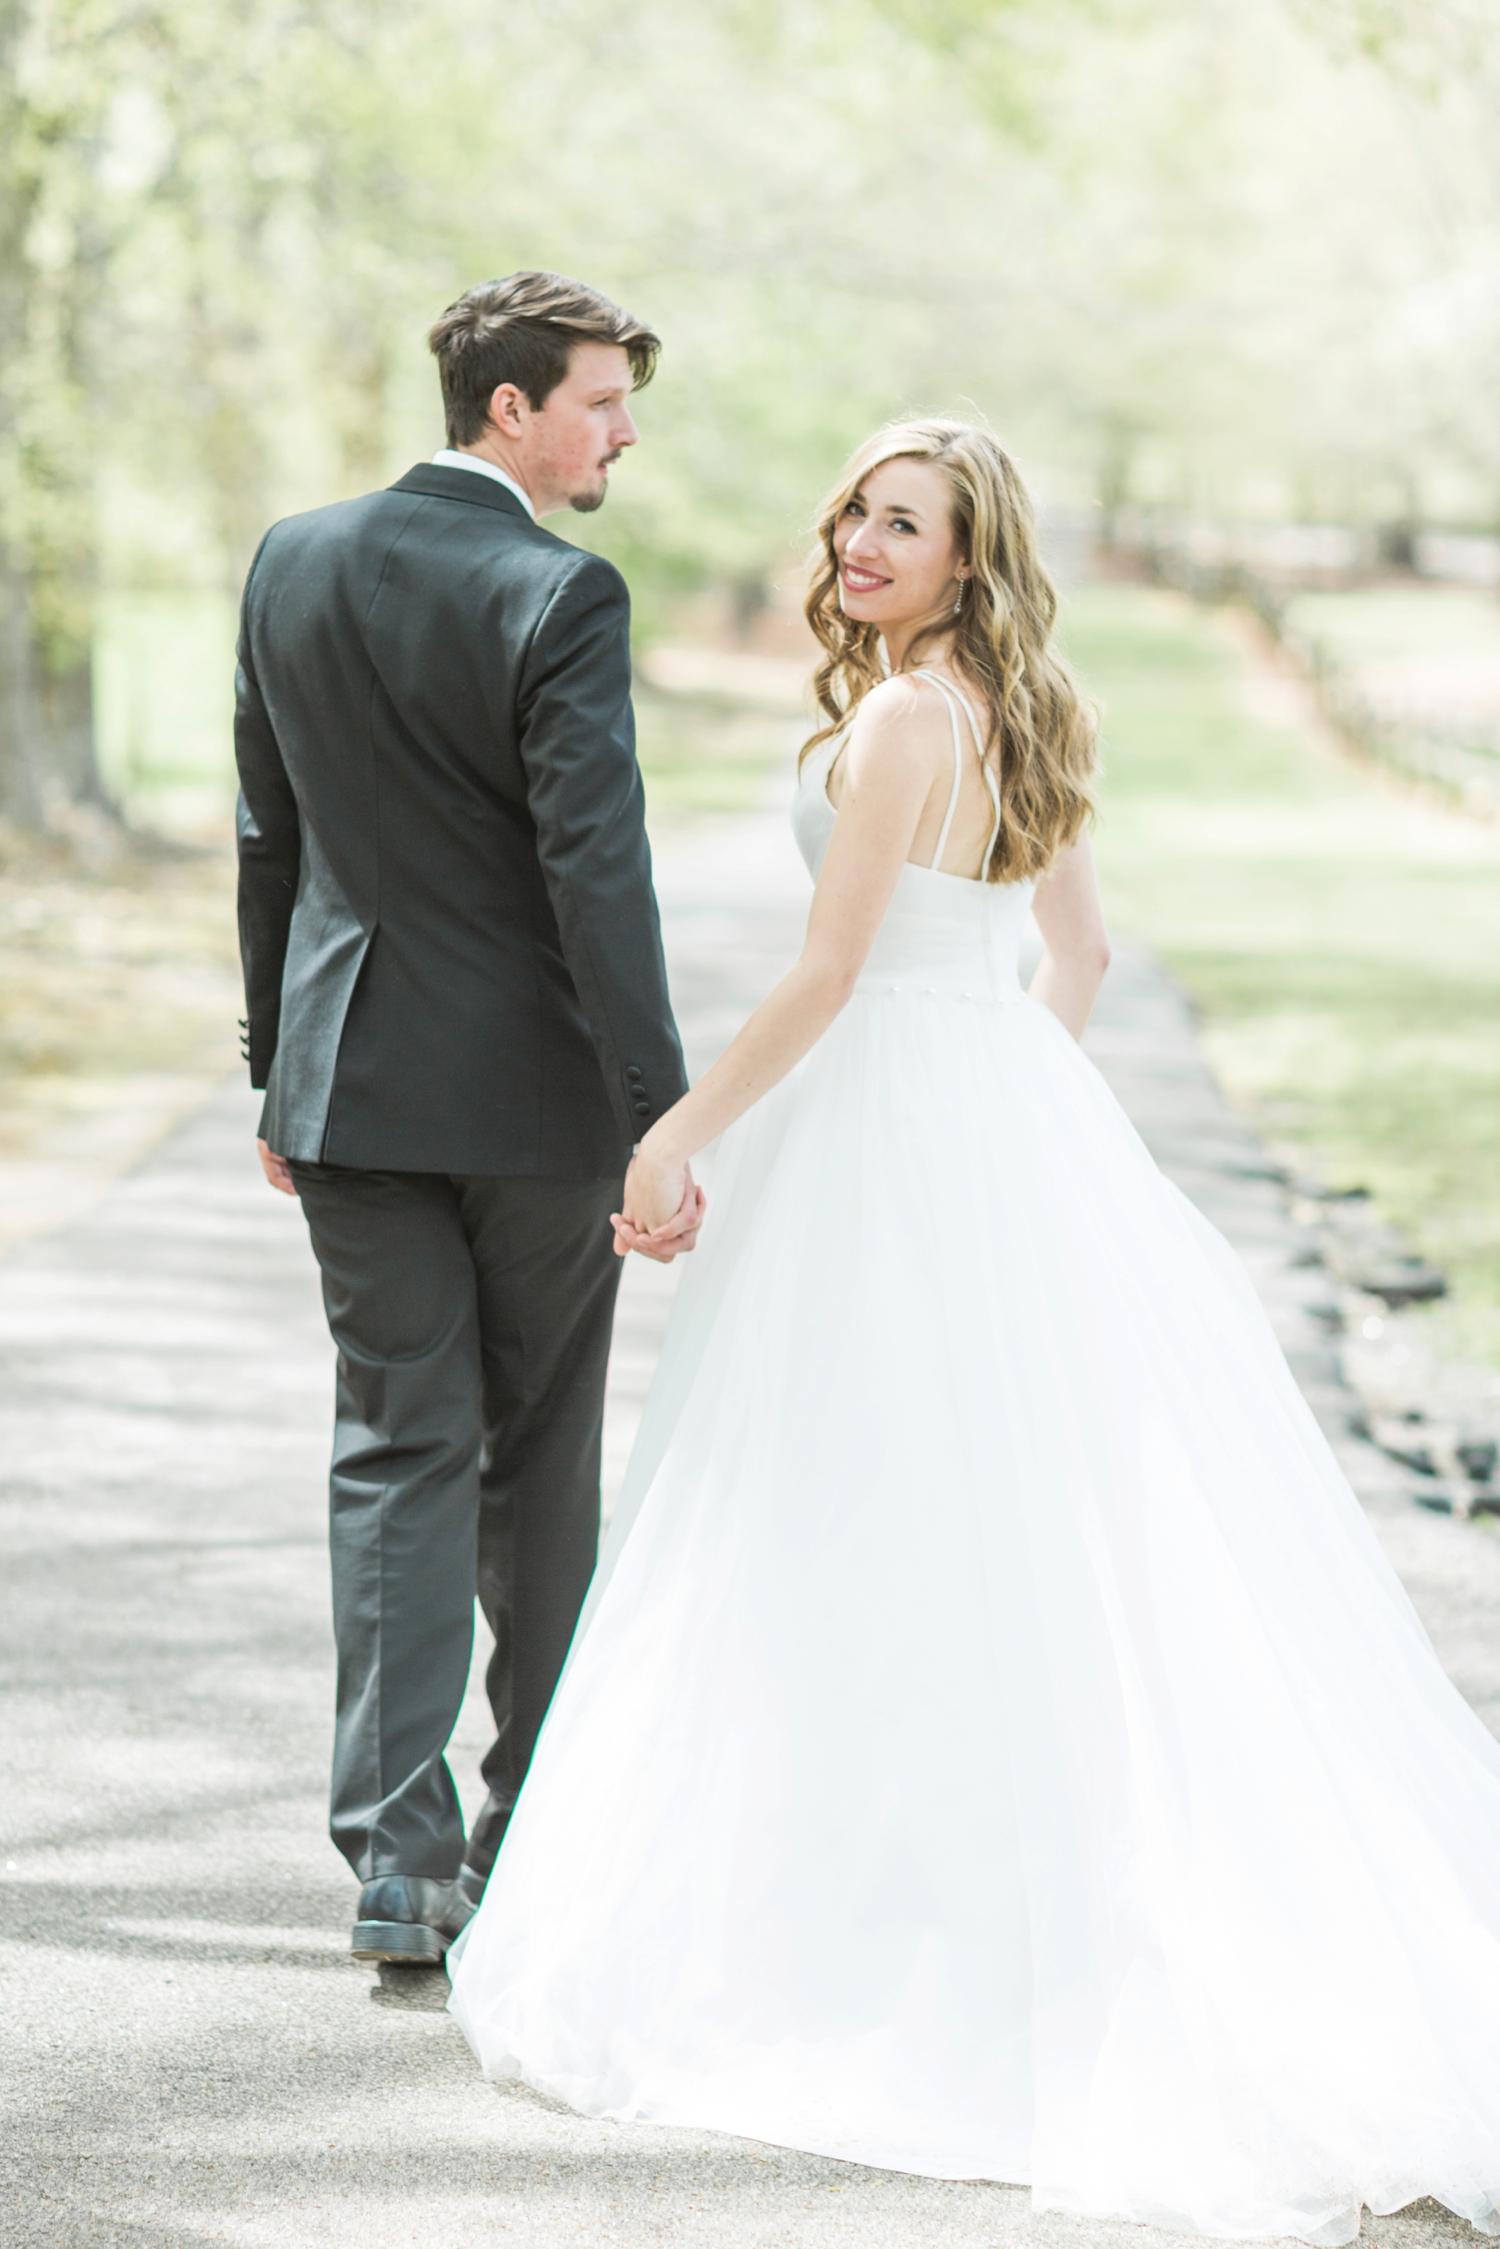 fine-art-film-charleston-south-carolina-wedding-photographer-atlanta-georgia_3424.jpg